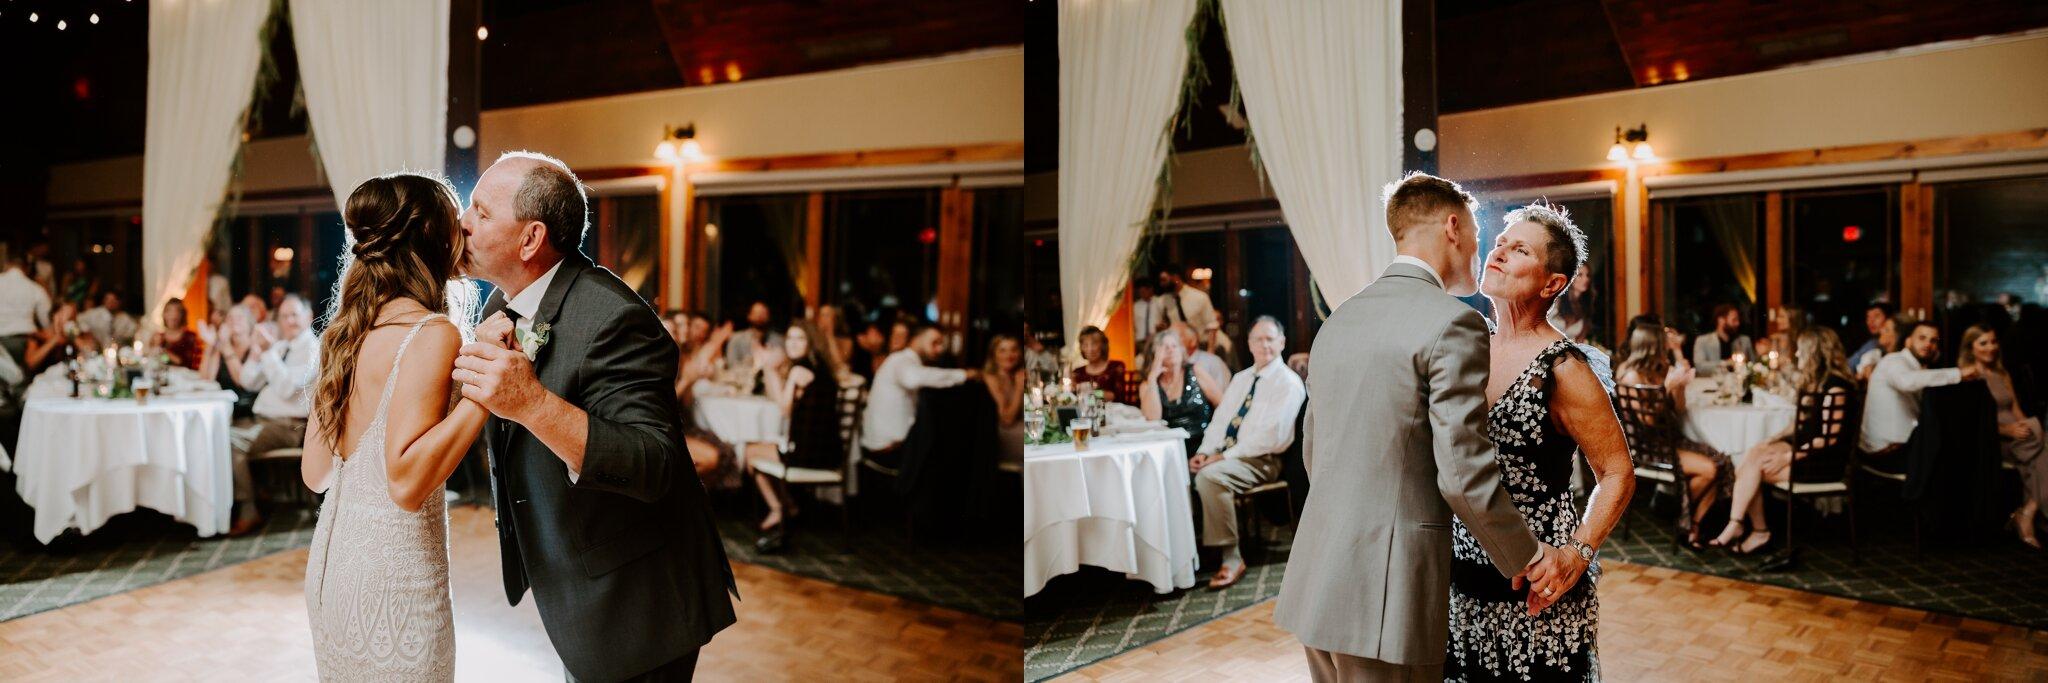 asheville-north-carolina-wedding-photographer_2734.jpg